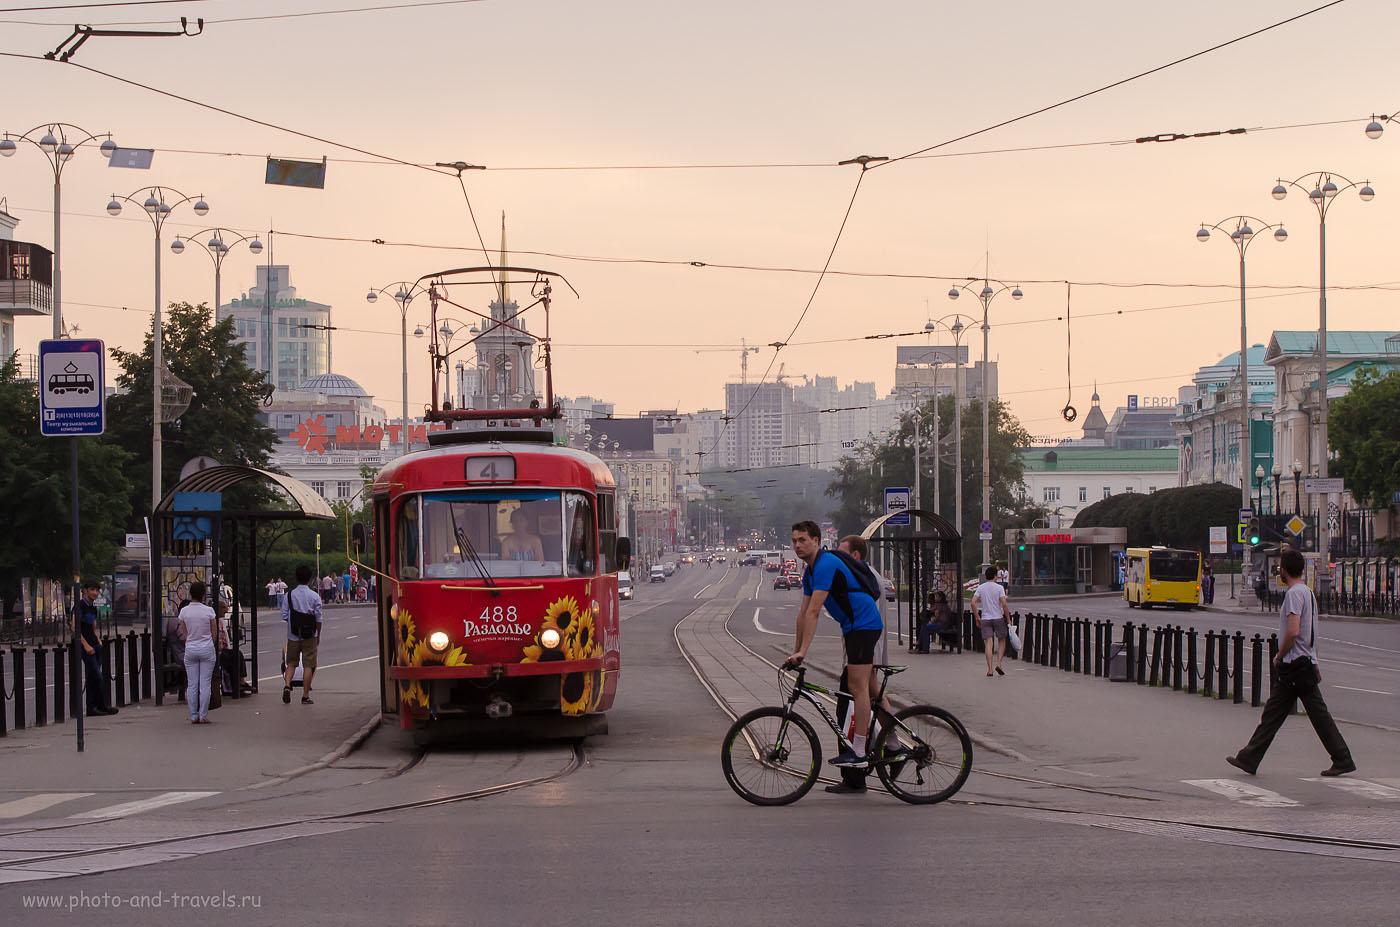 Фотография 22. Вечерний Екатеринбург, снятый на Nikon D5100 (1000, 70, 8.0, 1/320)